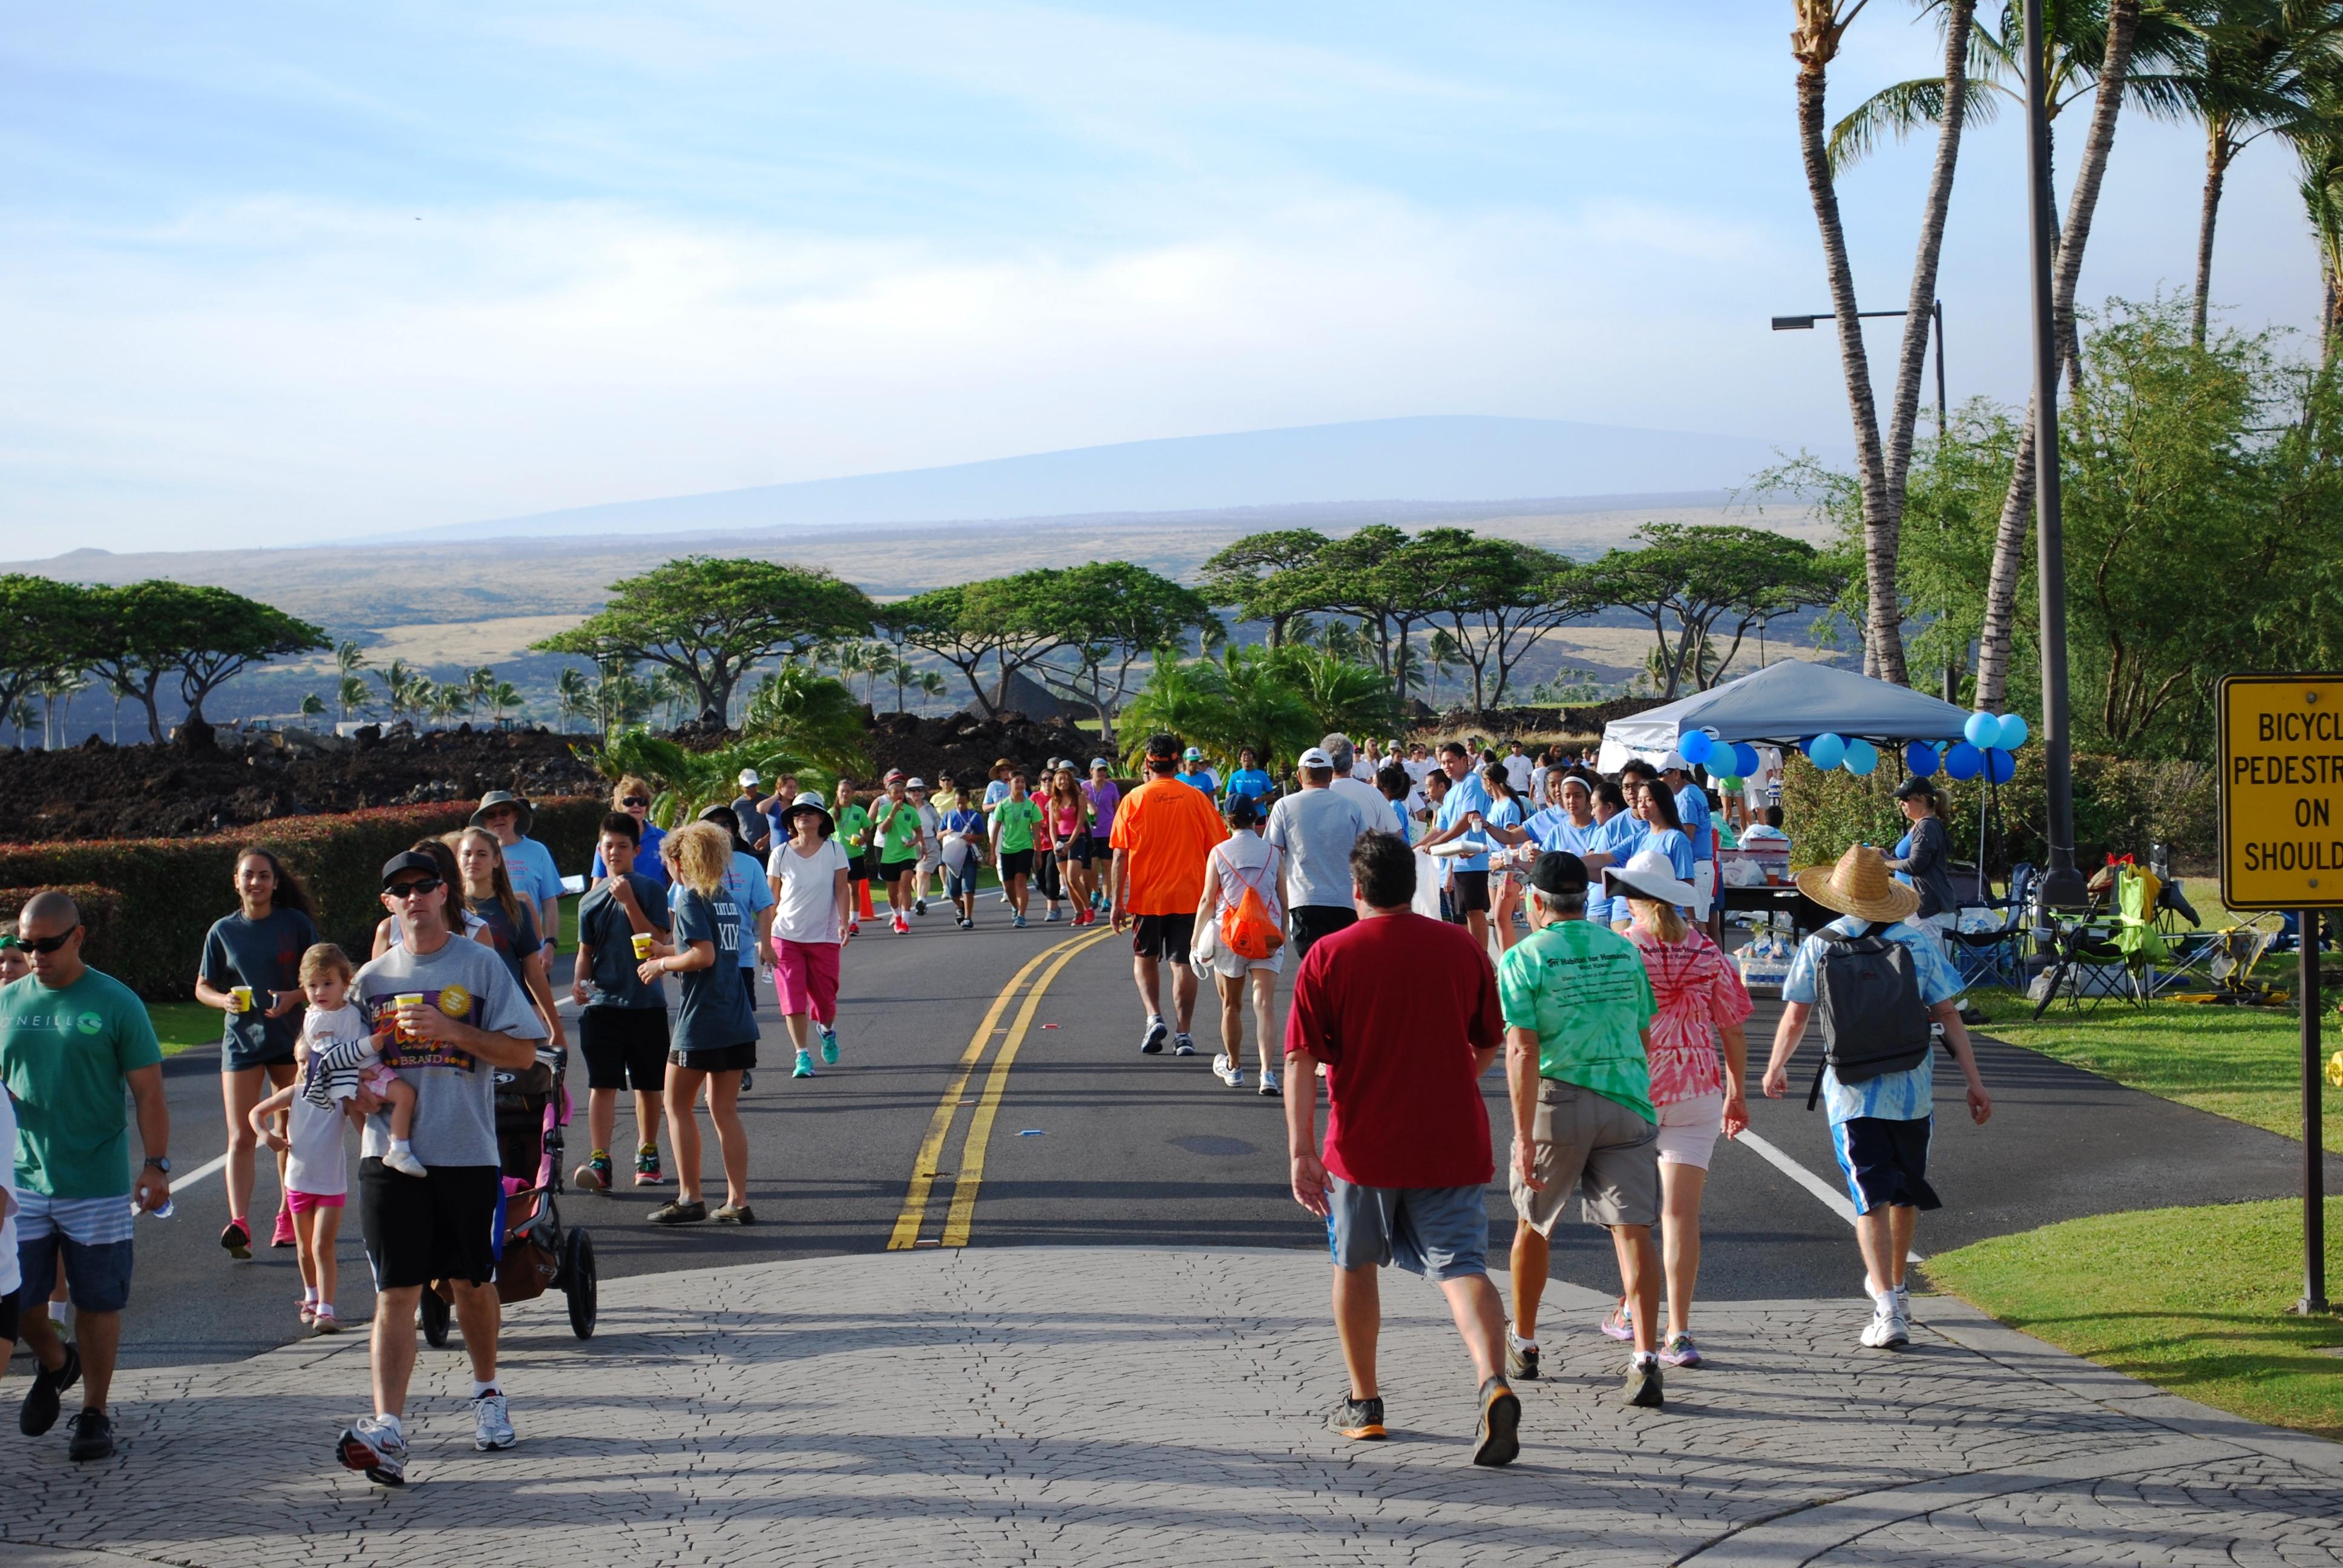 Charity Walk Hawaii Hlta Charity Walk Raises Over